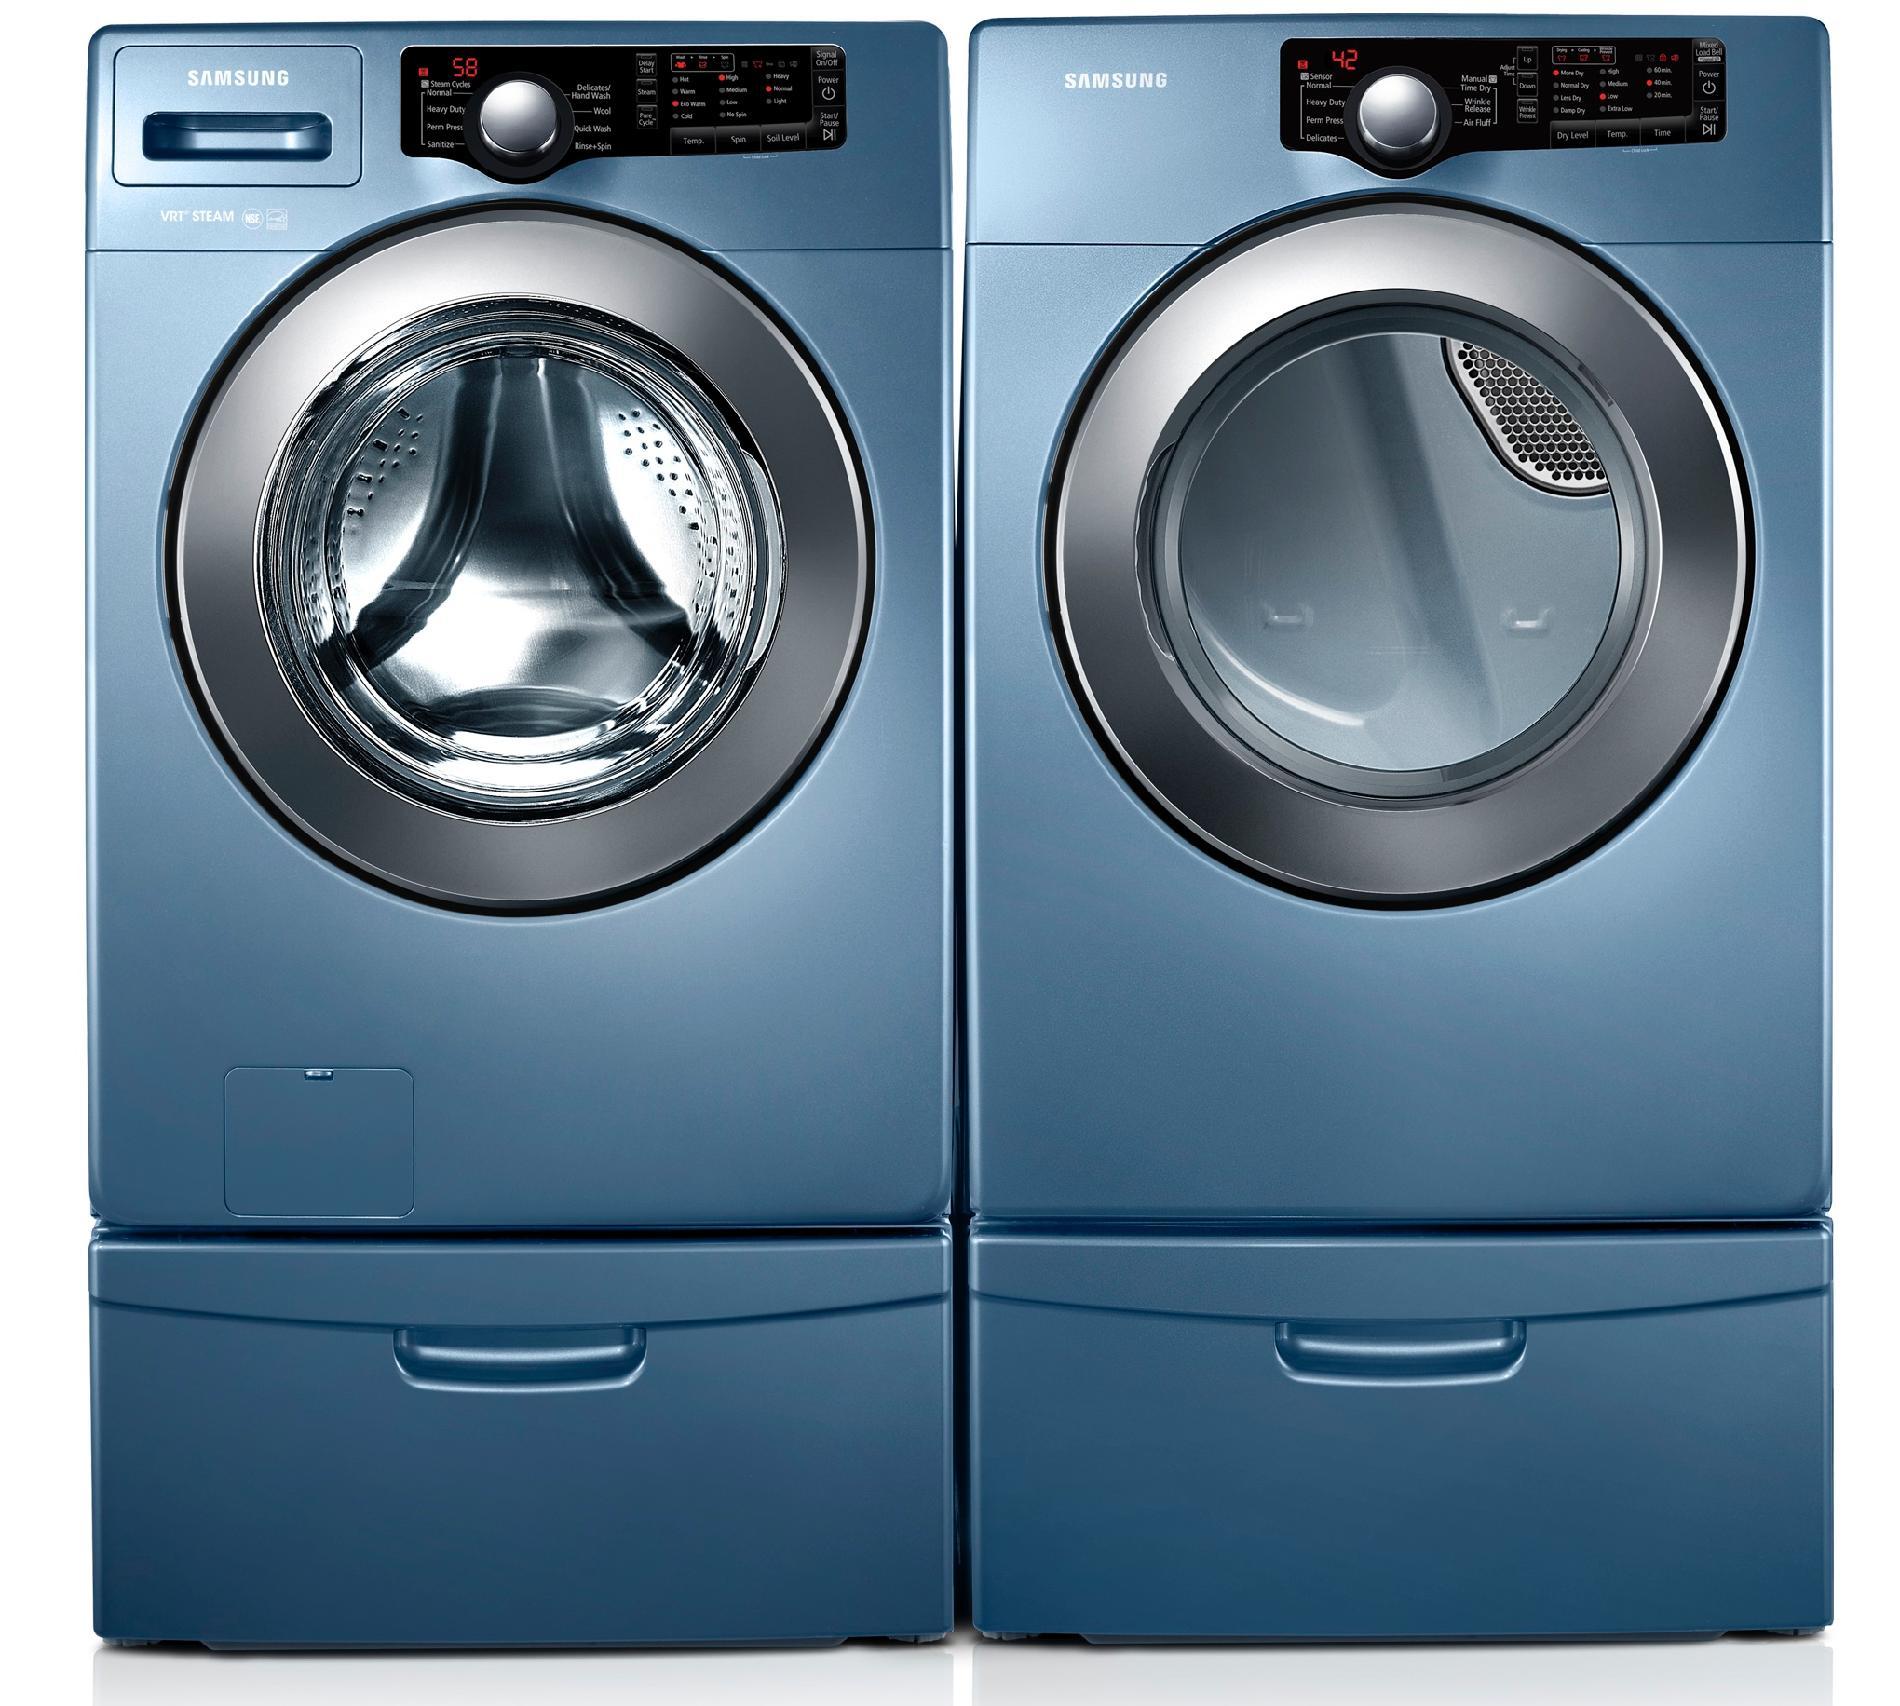 Samsung 3.6 cu. ft. High-Efficiency Front-Load Washer - Blue